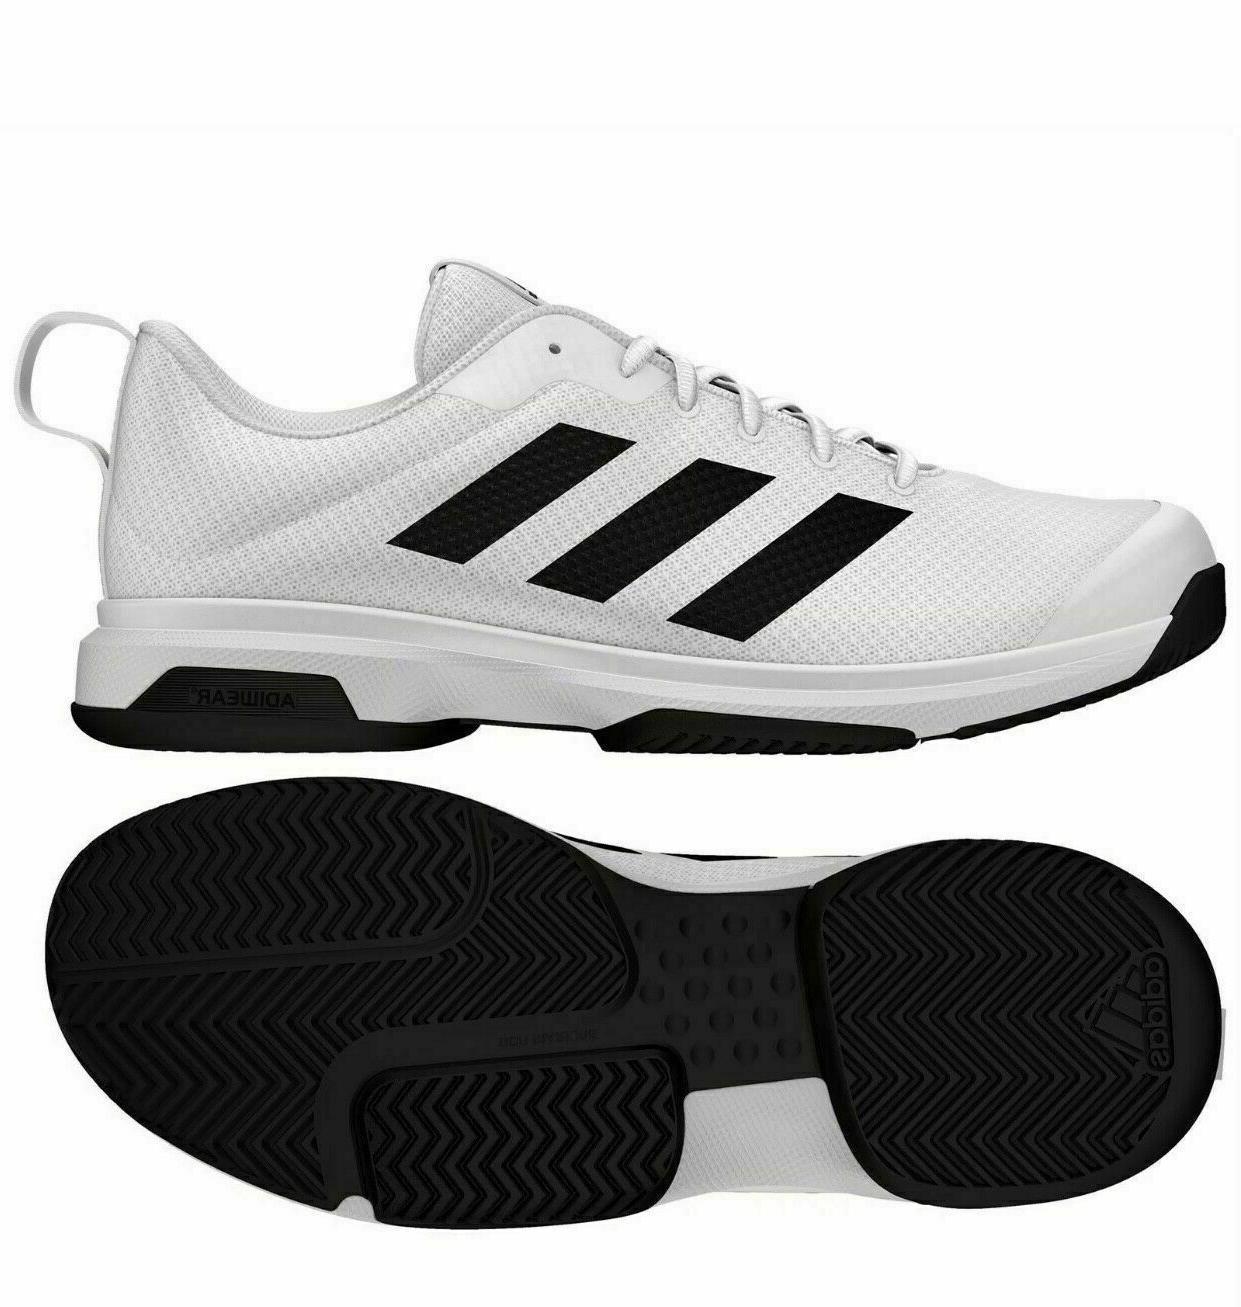 NIB Adidas Spec Black/White Various Size